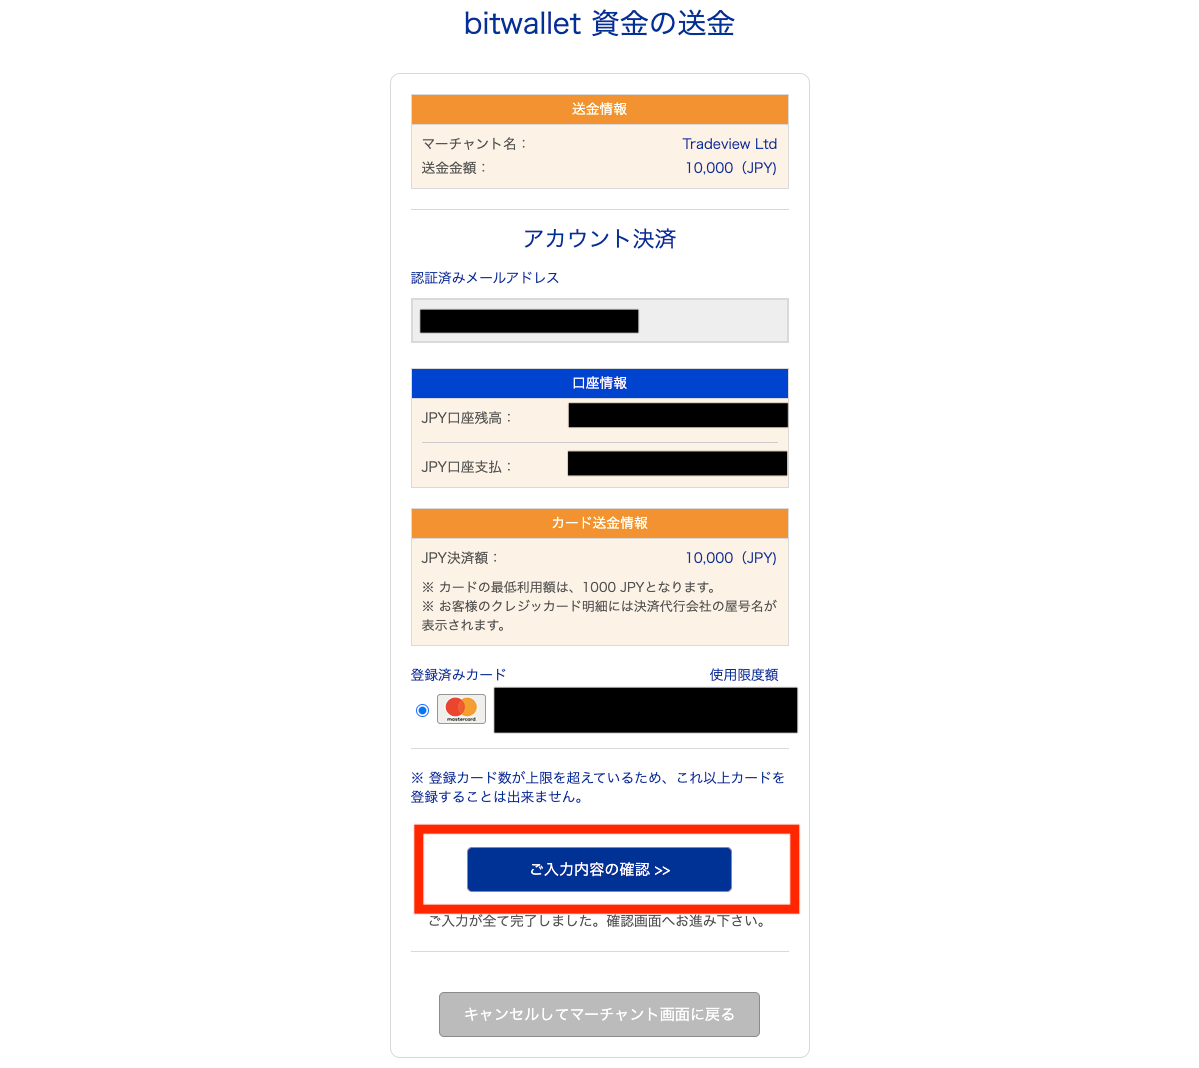 tradeview_nyukin5